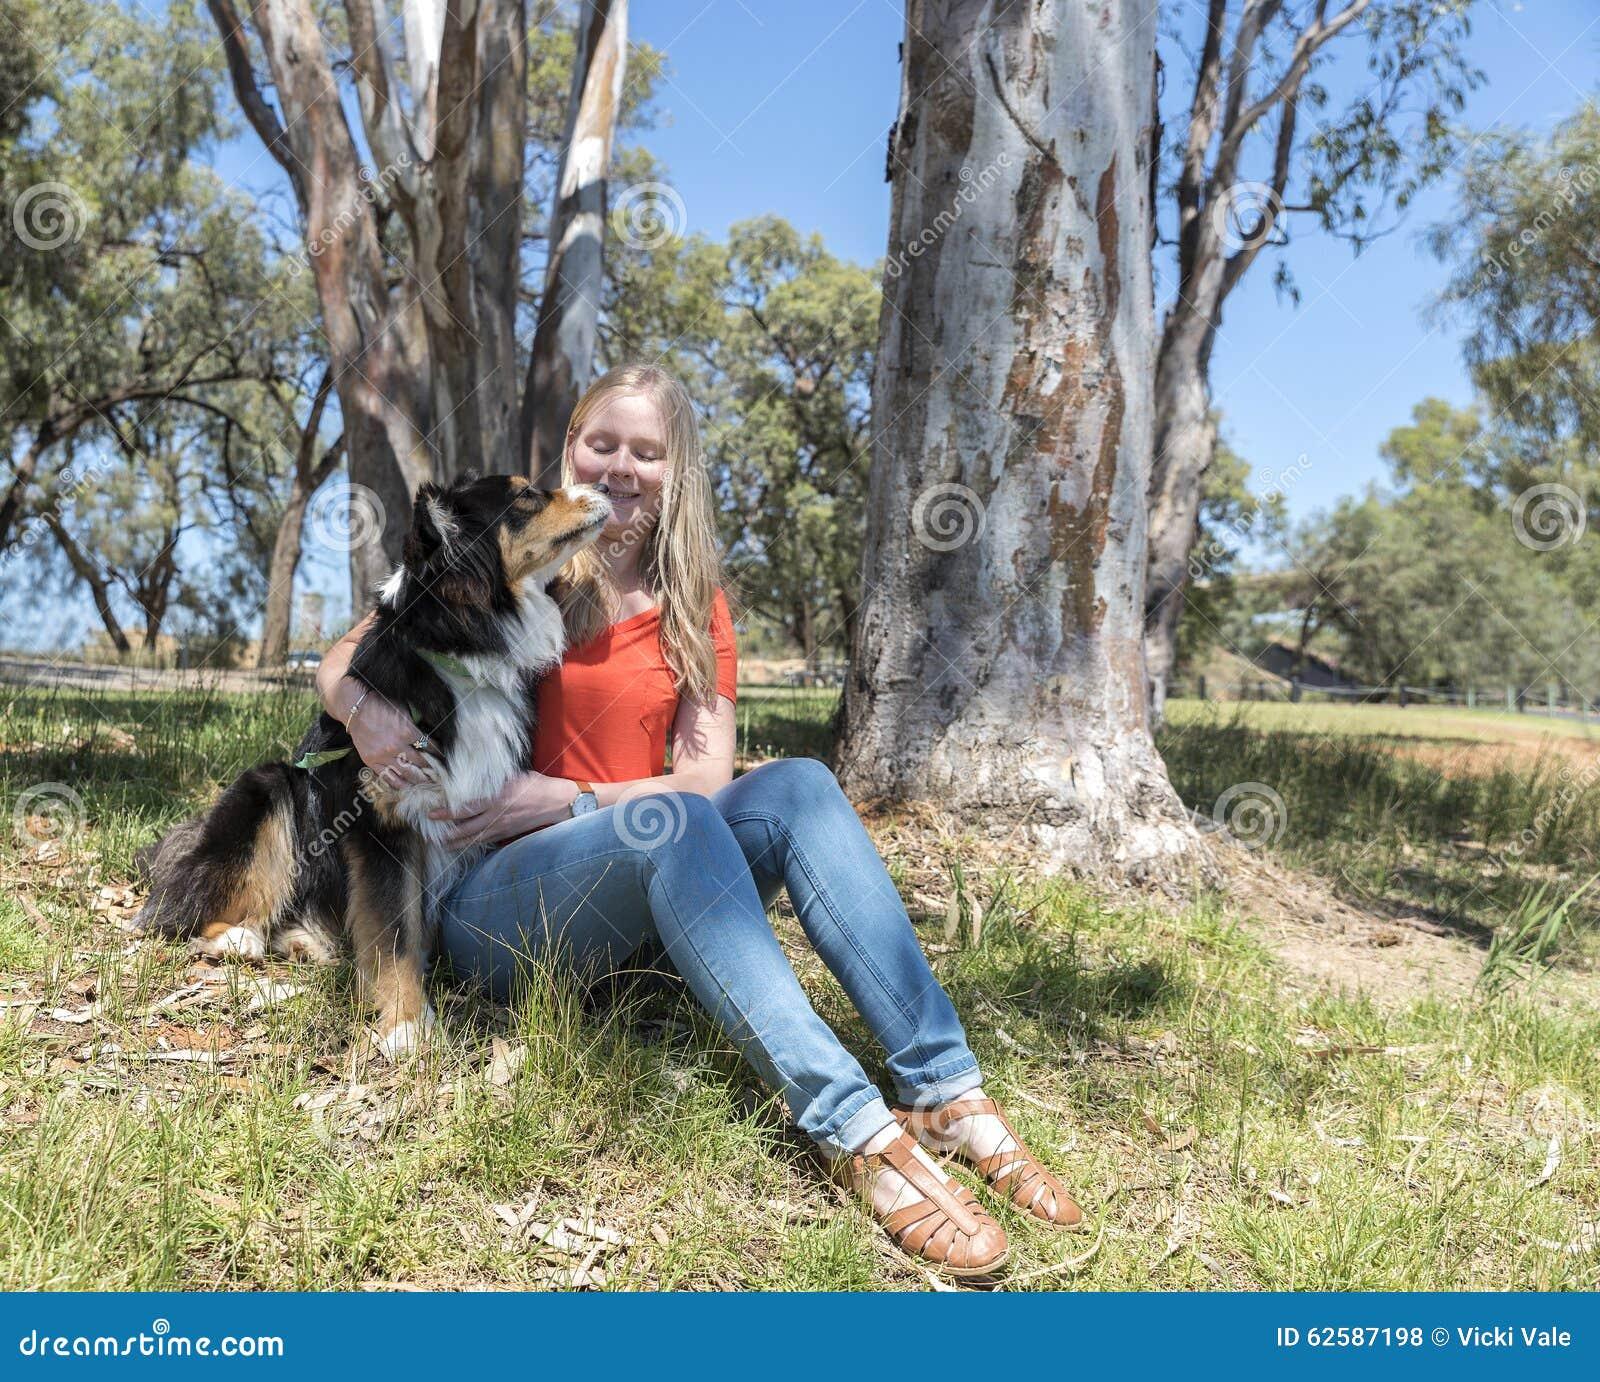 Hund Leckt Frau Muschi Ab - Fireball